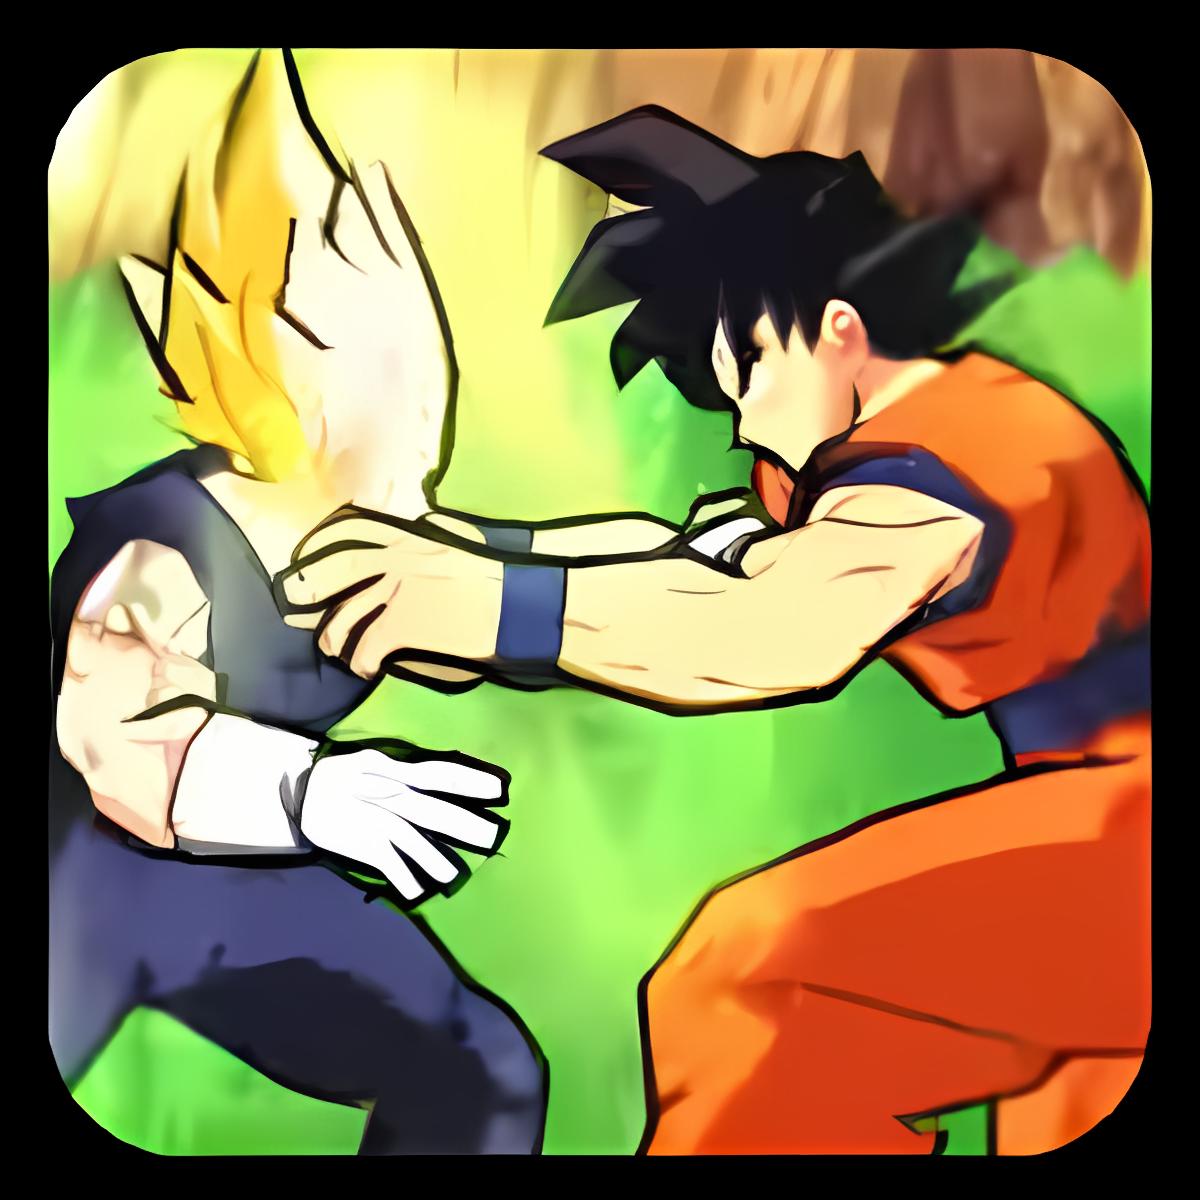 Super Goku: SuperSonic Warrior